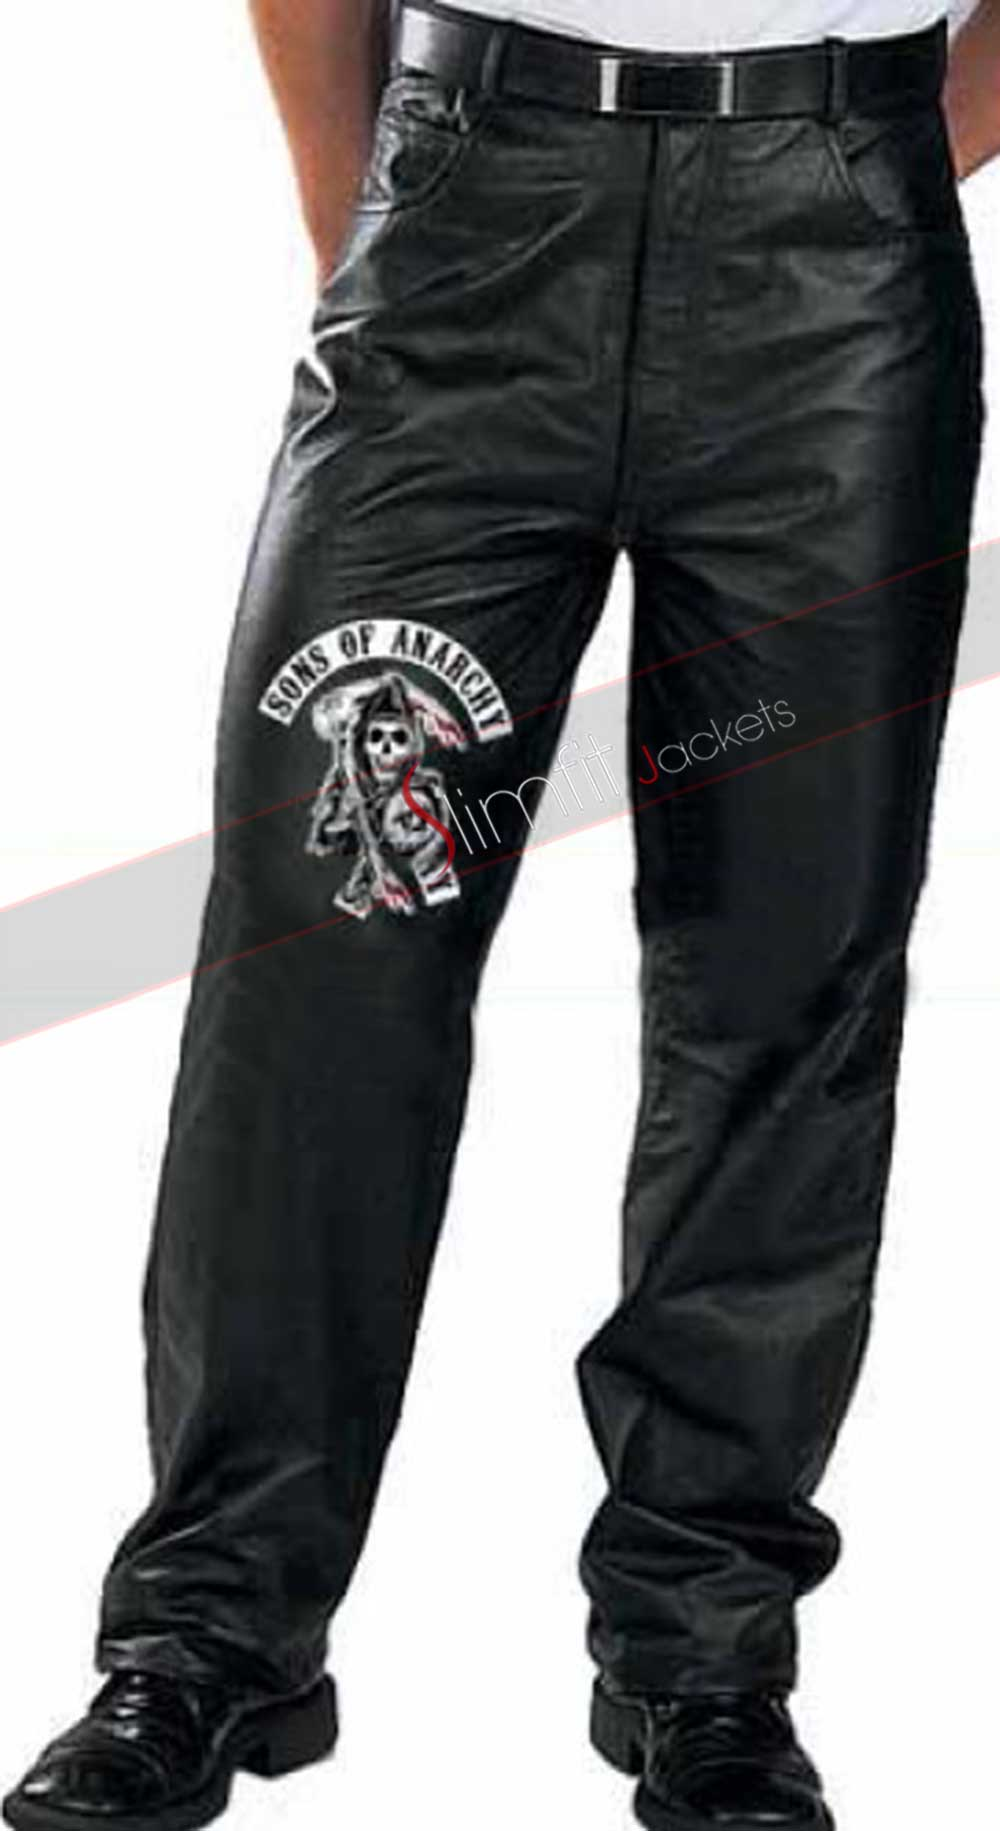 evel knievel vintage biker white leather pants